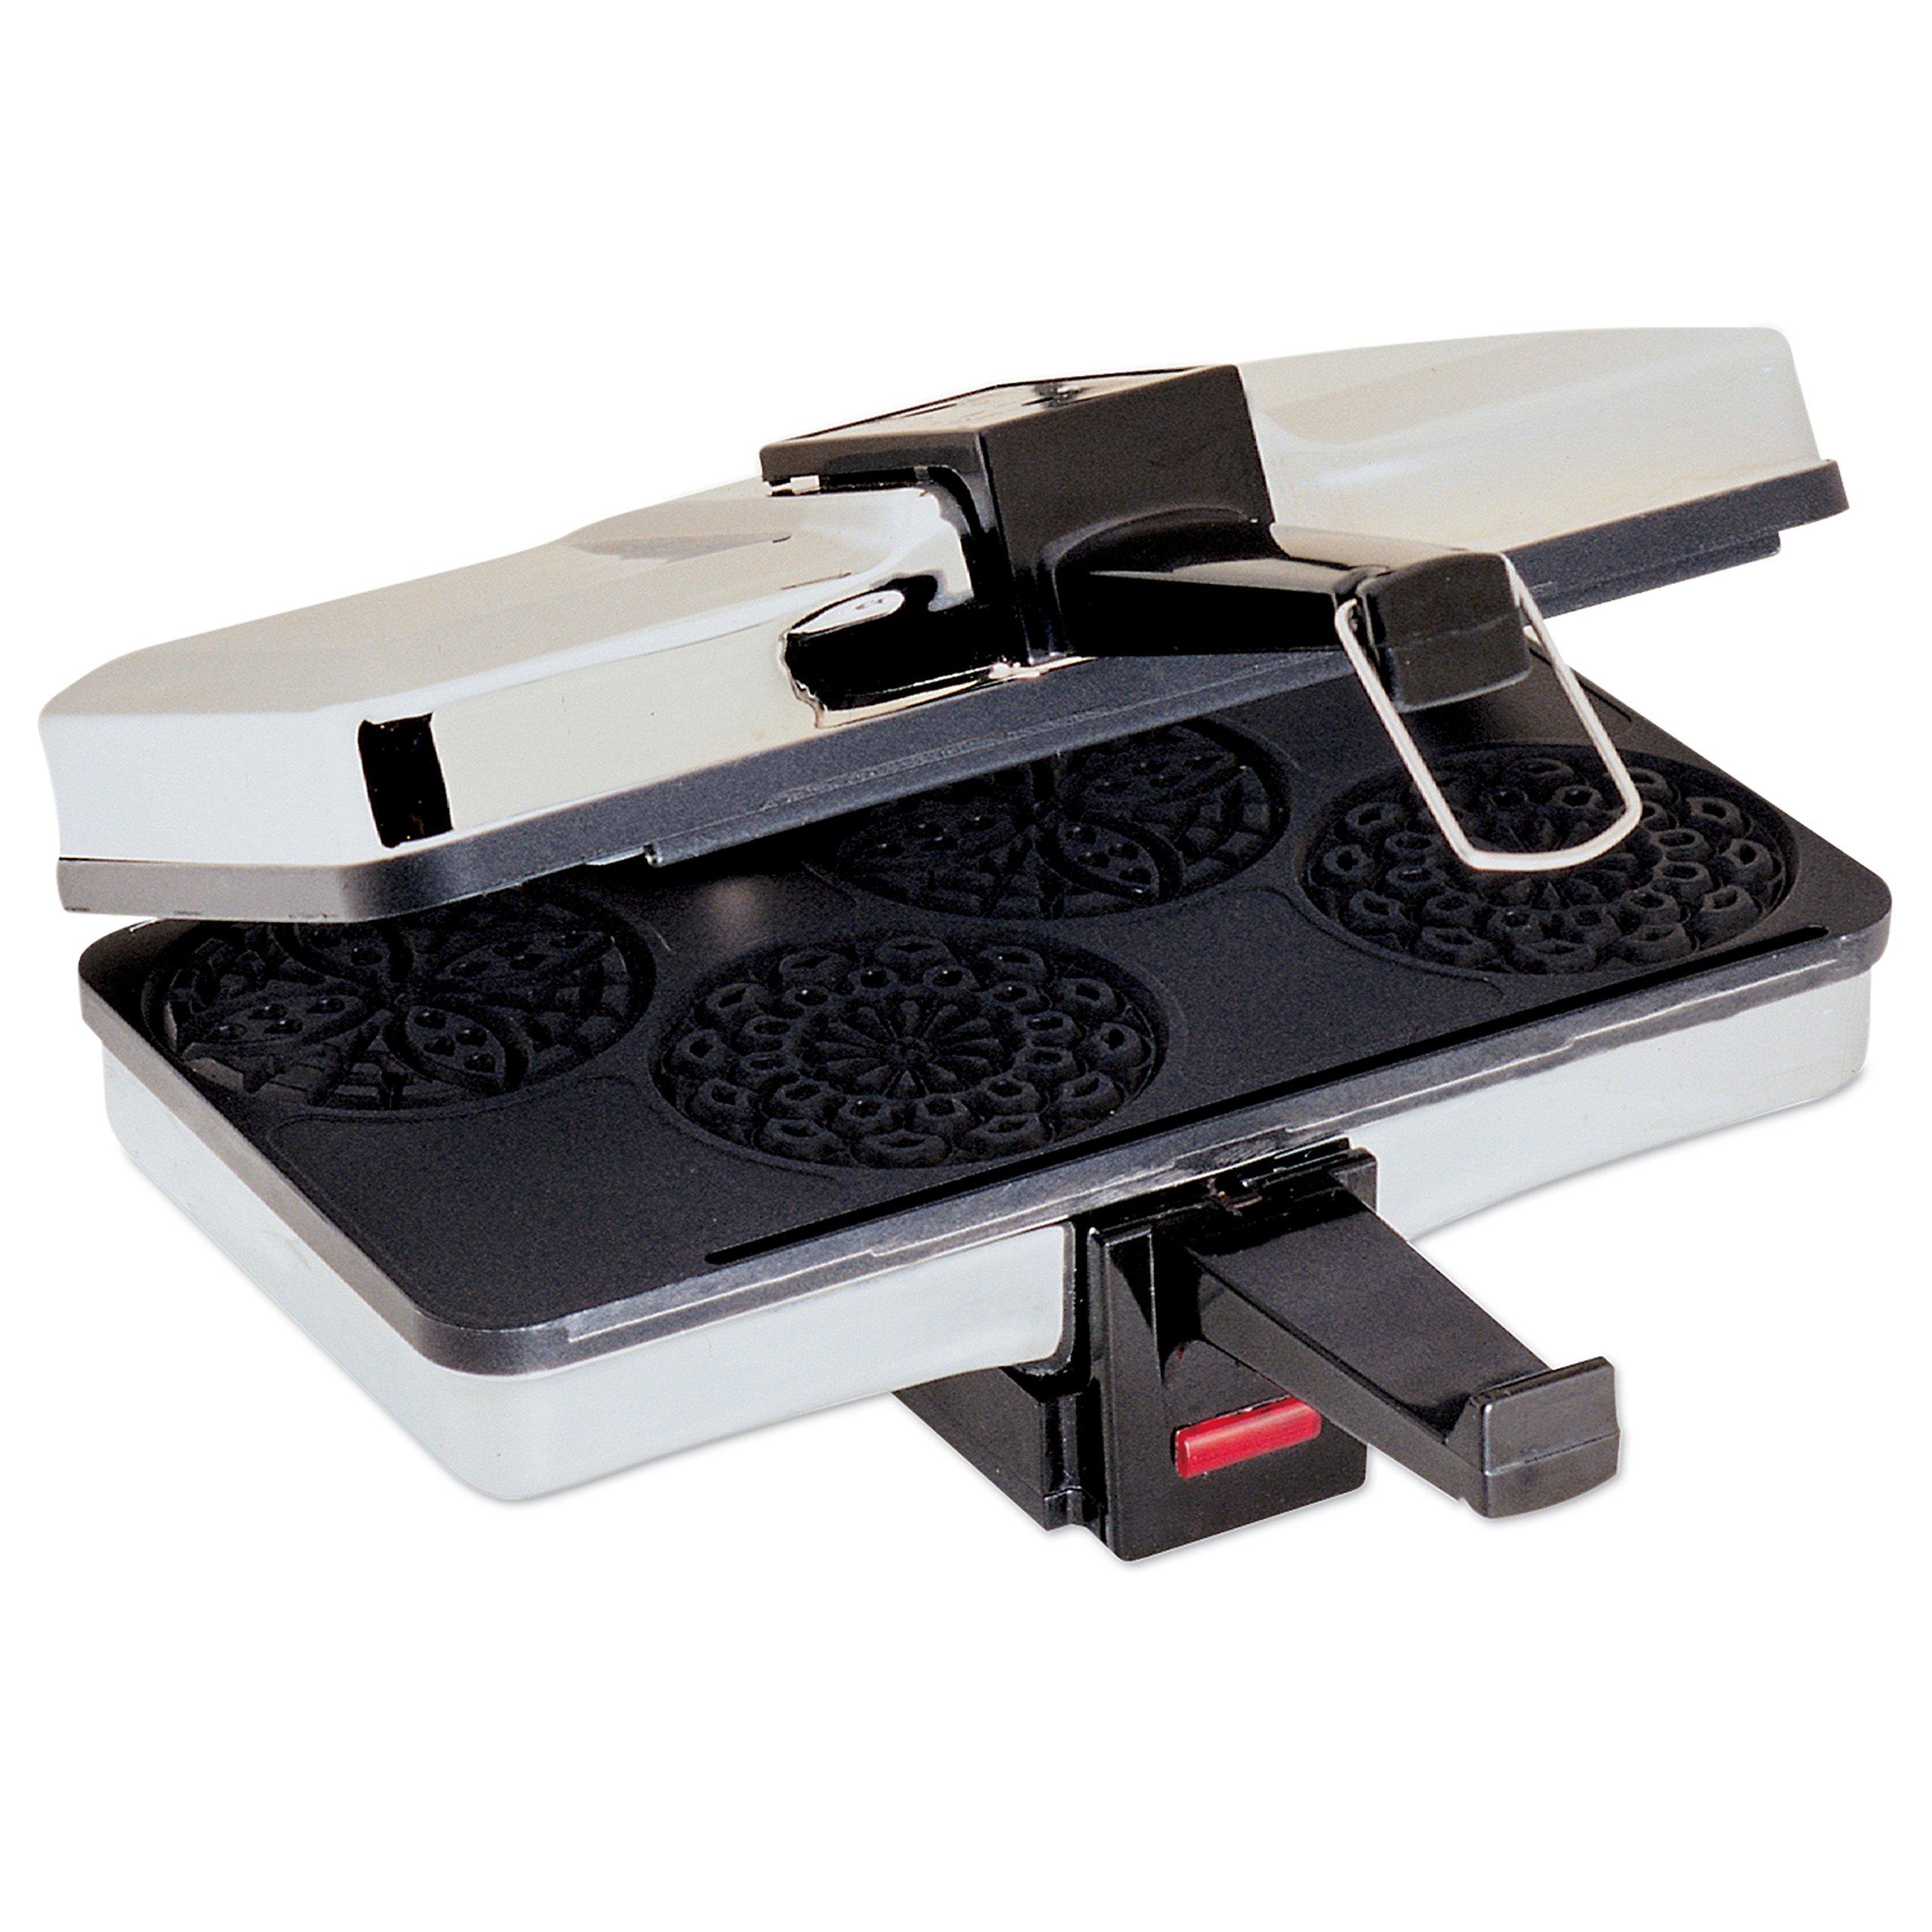 Mini Pizzelle Italian Waffle Iron Maker Baker Makes Four 3 1 4 Inch